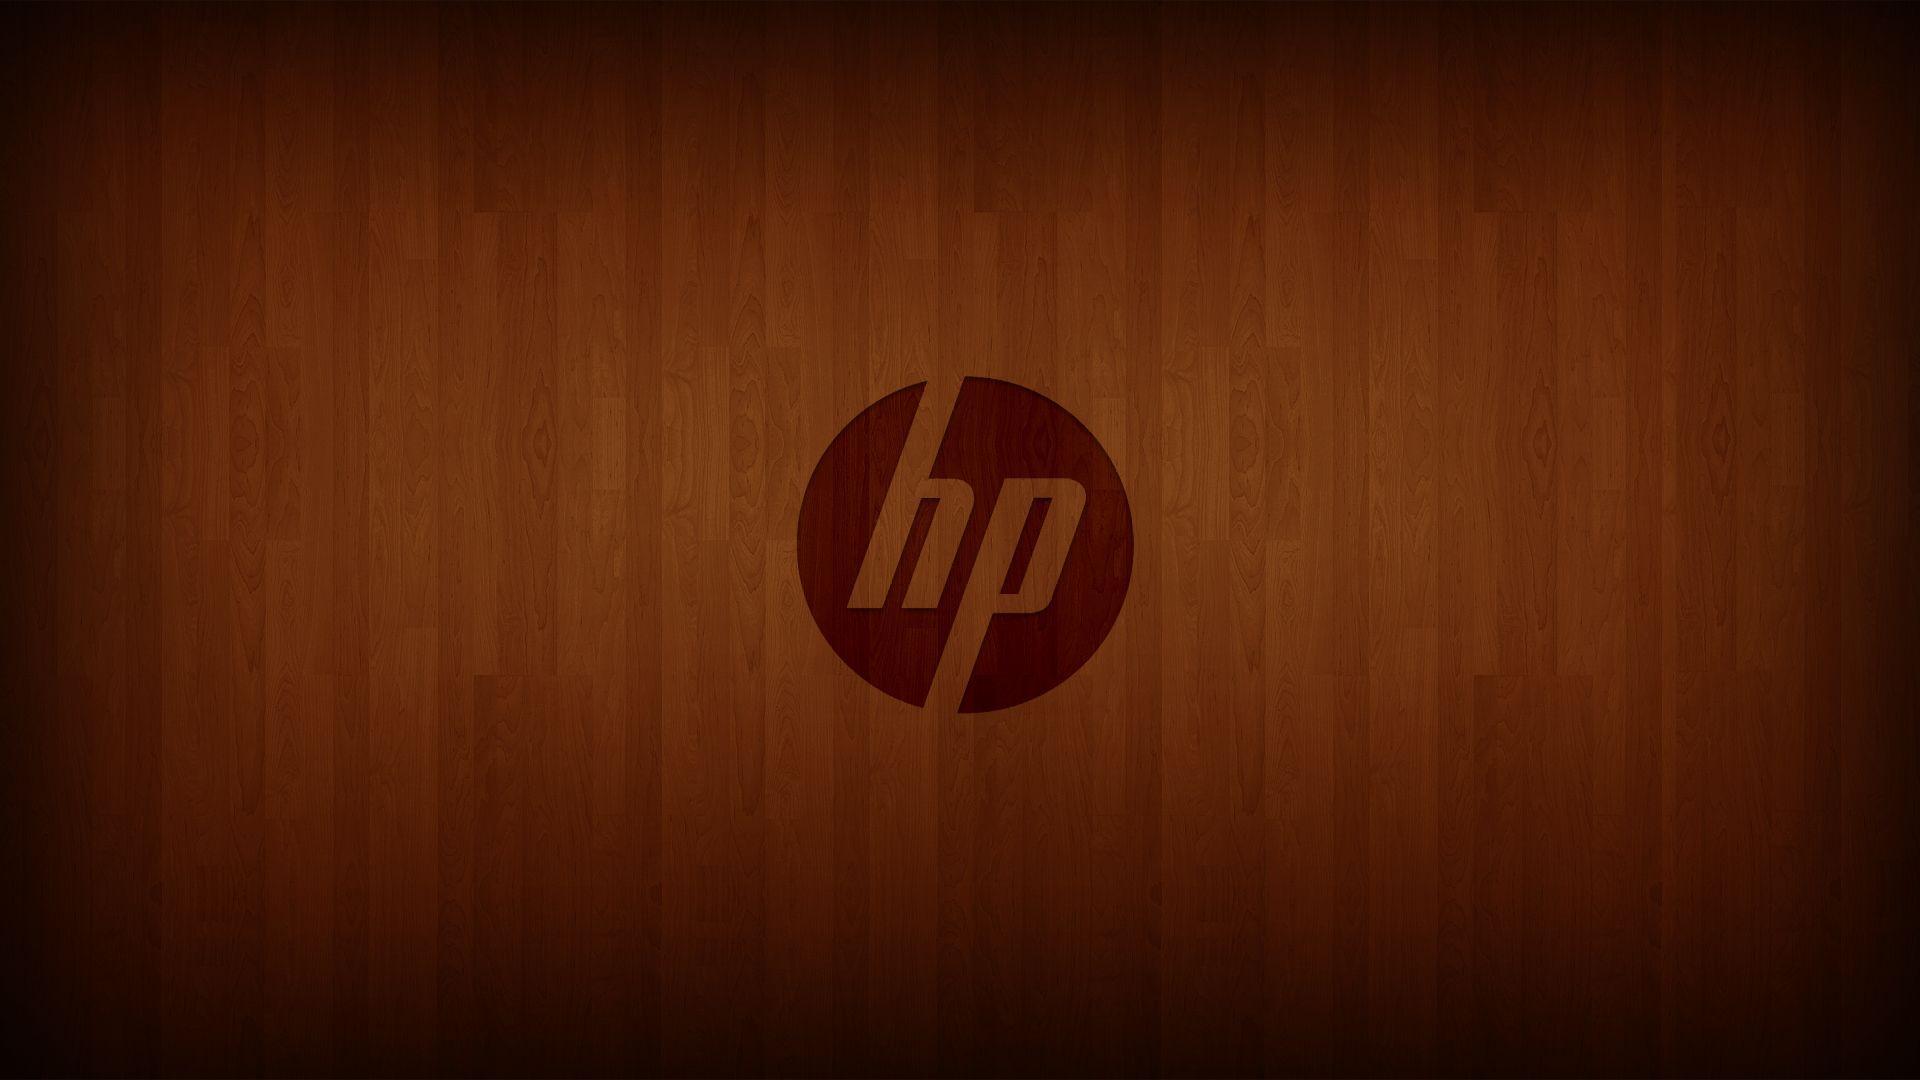 Hp Laptop Wallpapers Wallpaper Cave